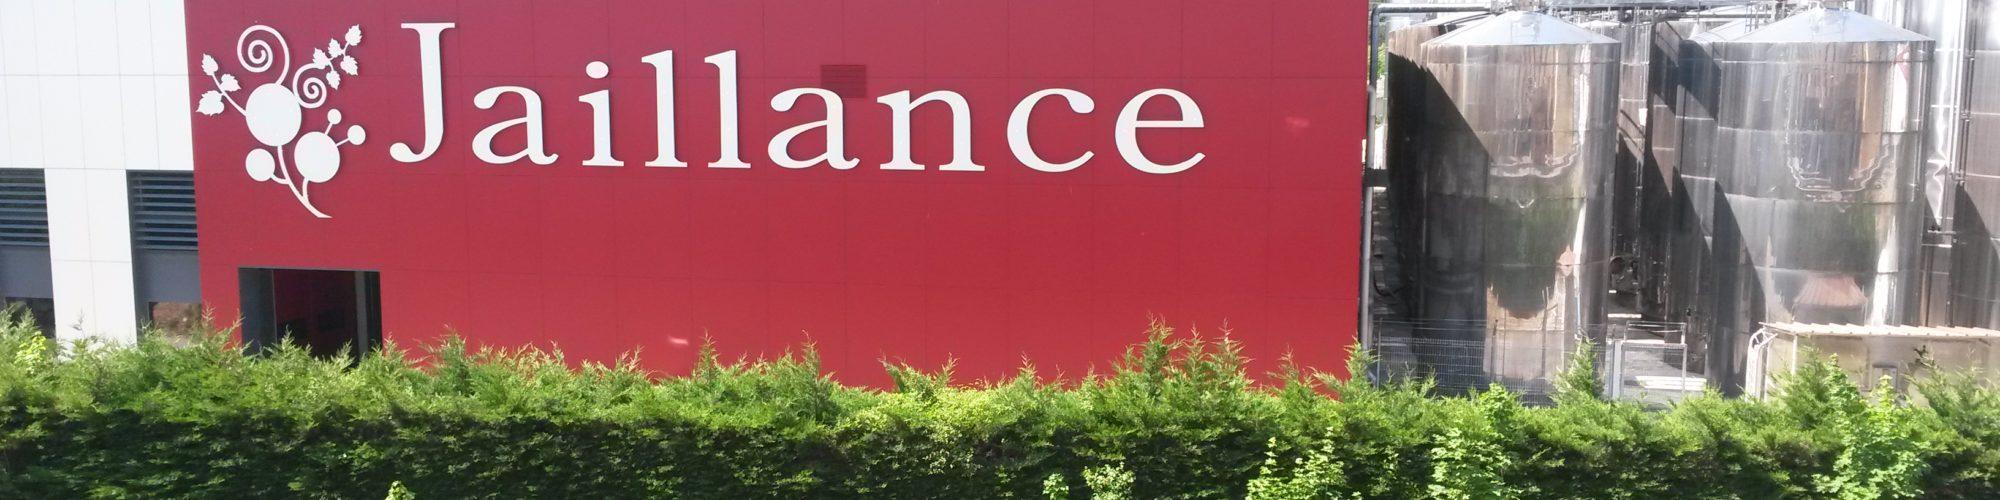 Ingeco - Ingénierie vinicole : Jaillance